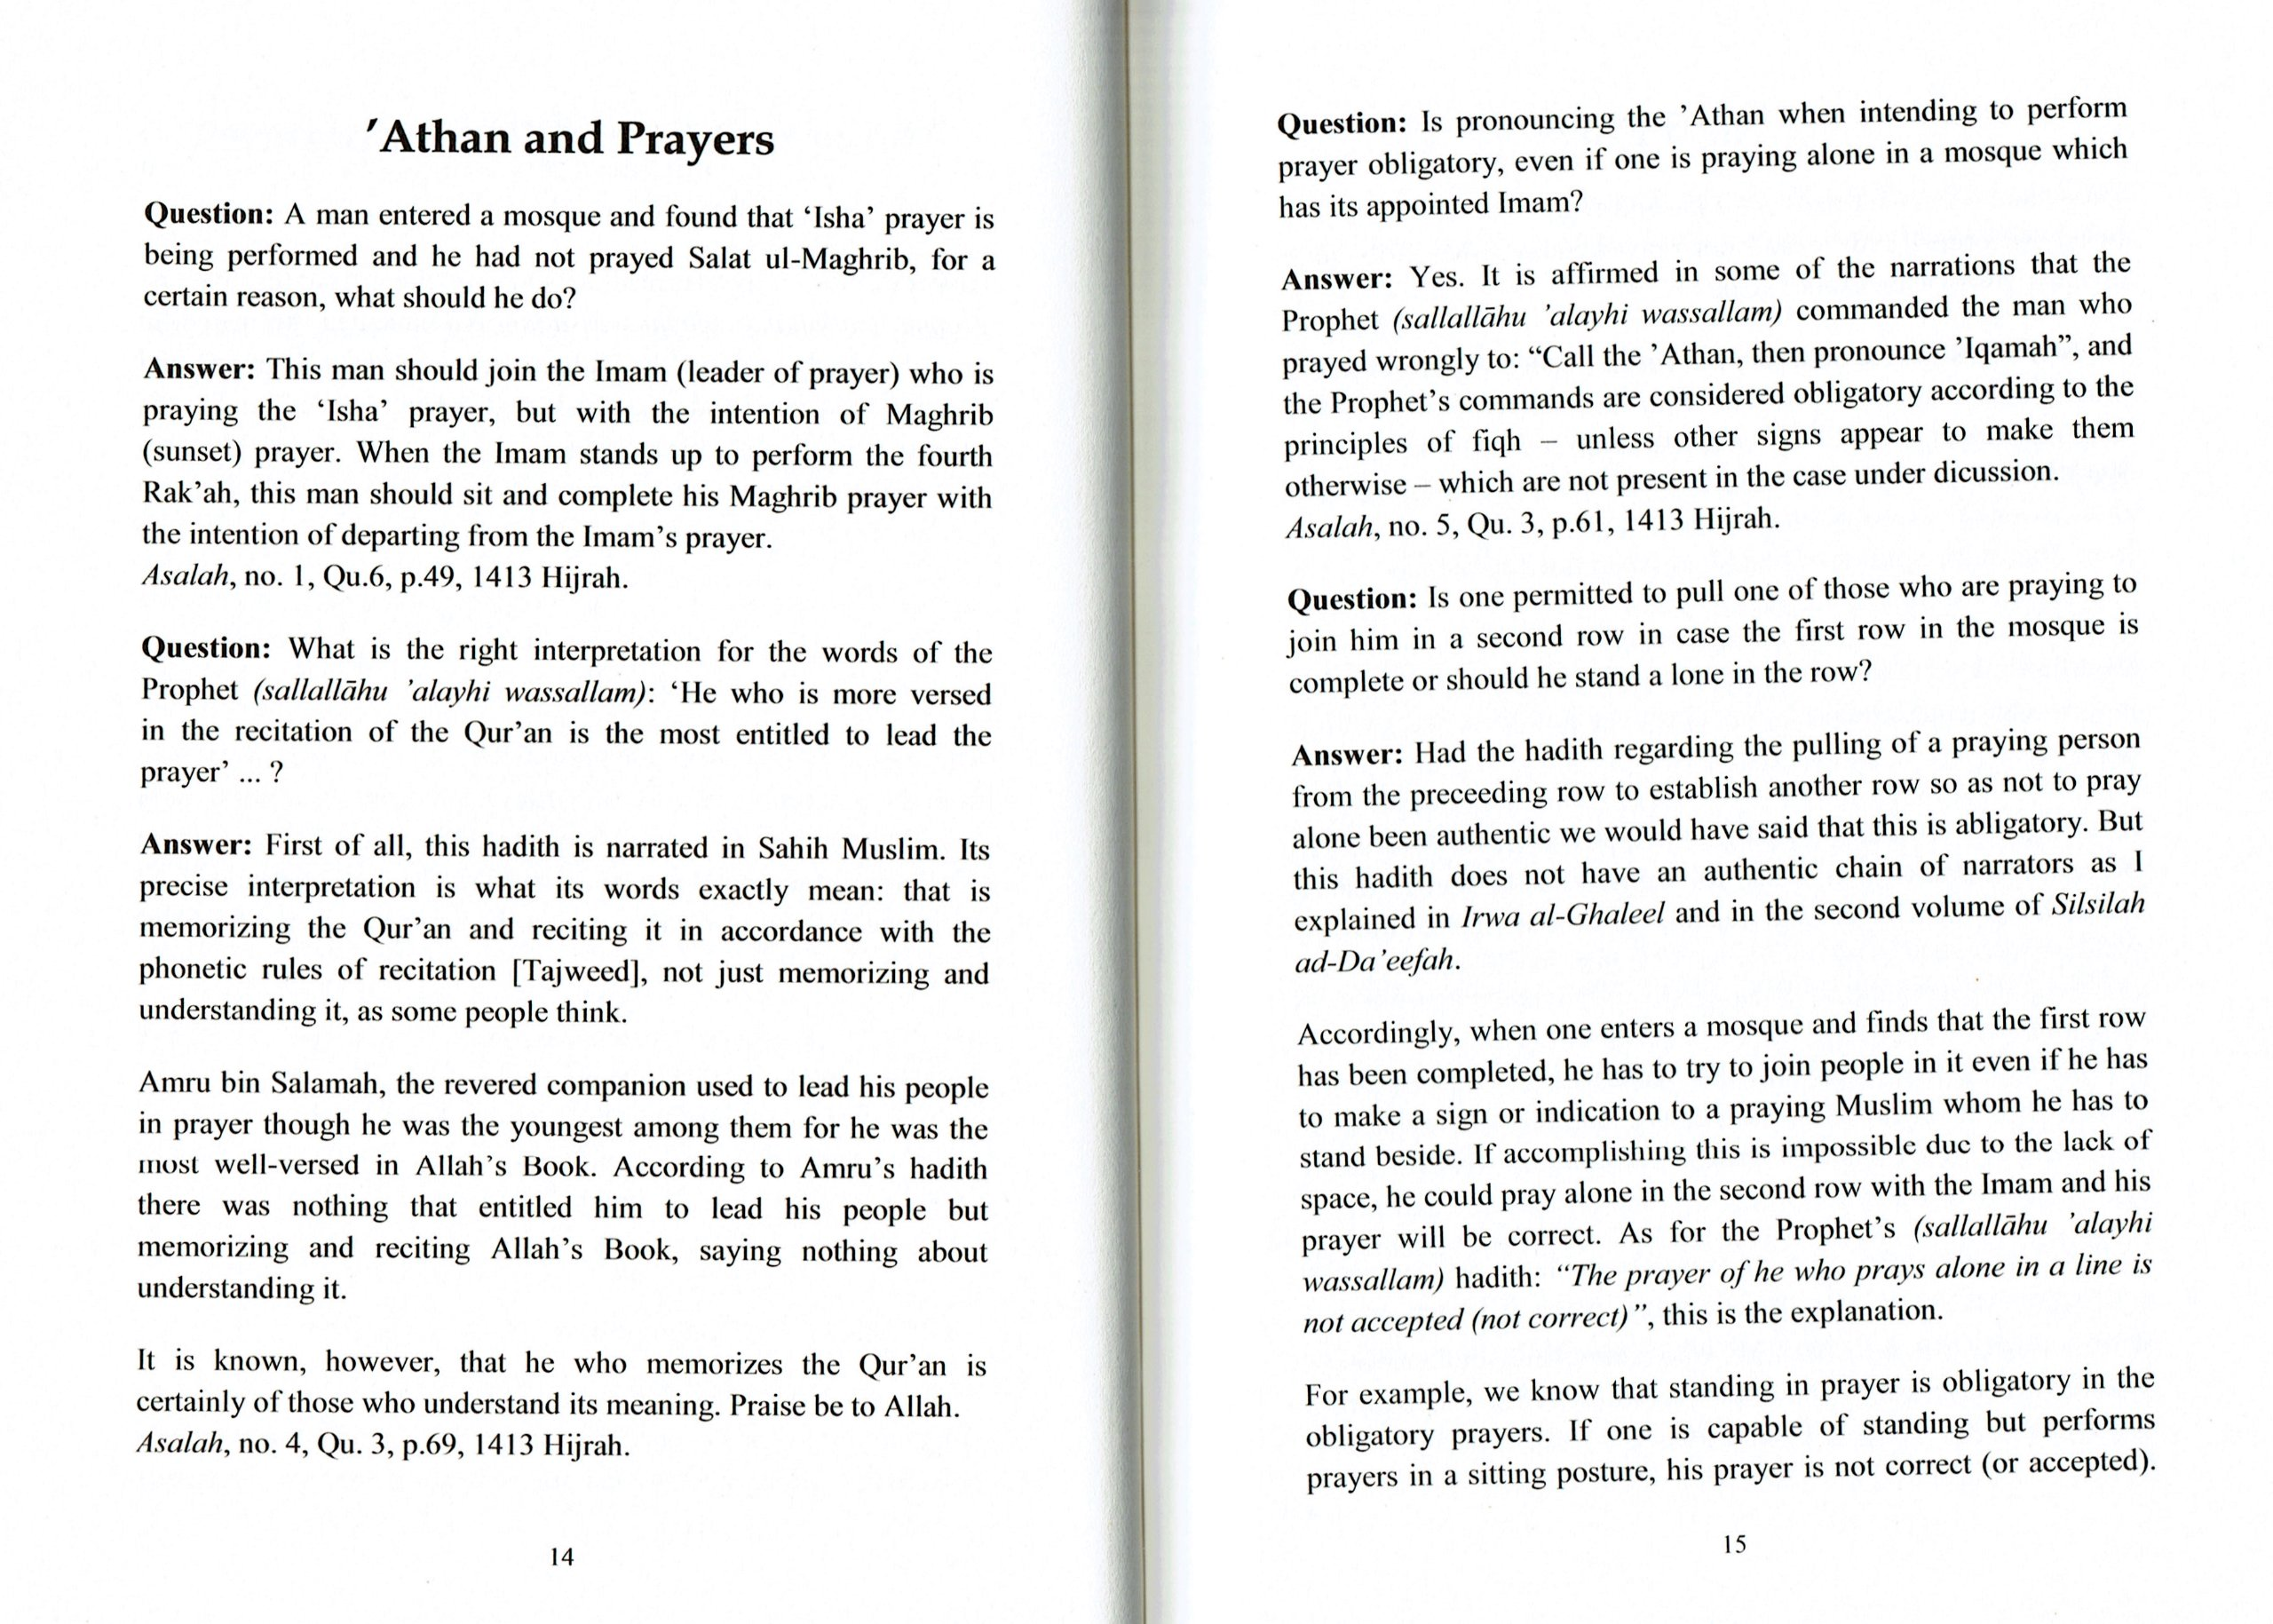 The Fatwas of Imam Al Albani Regarding Fiqh, Creed